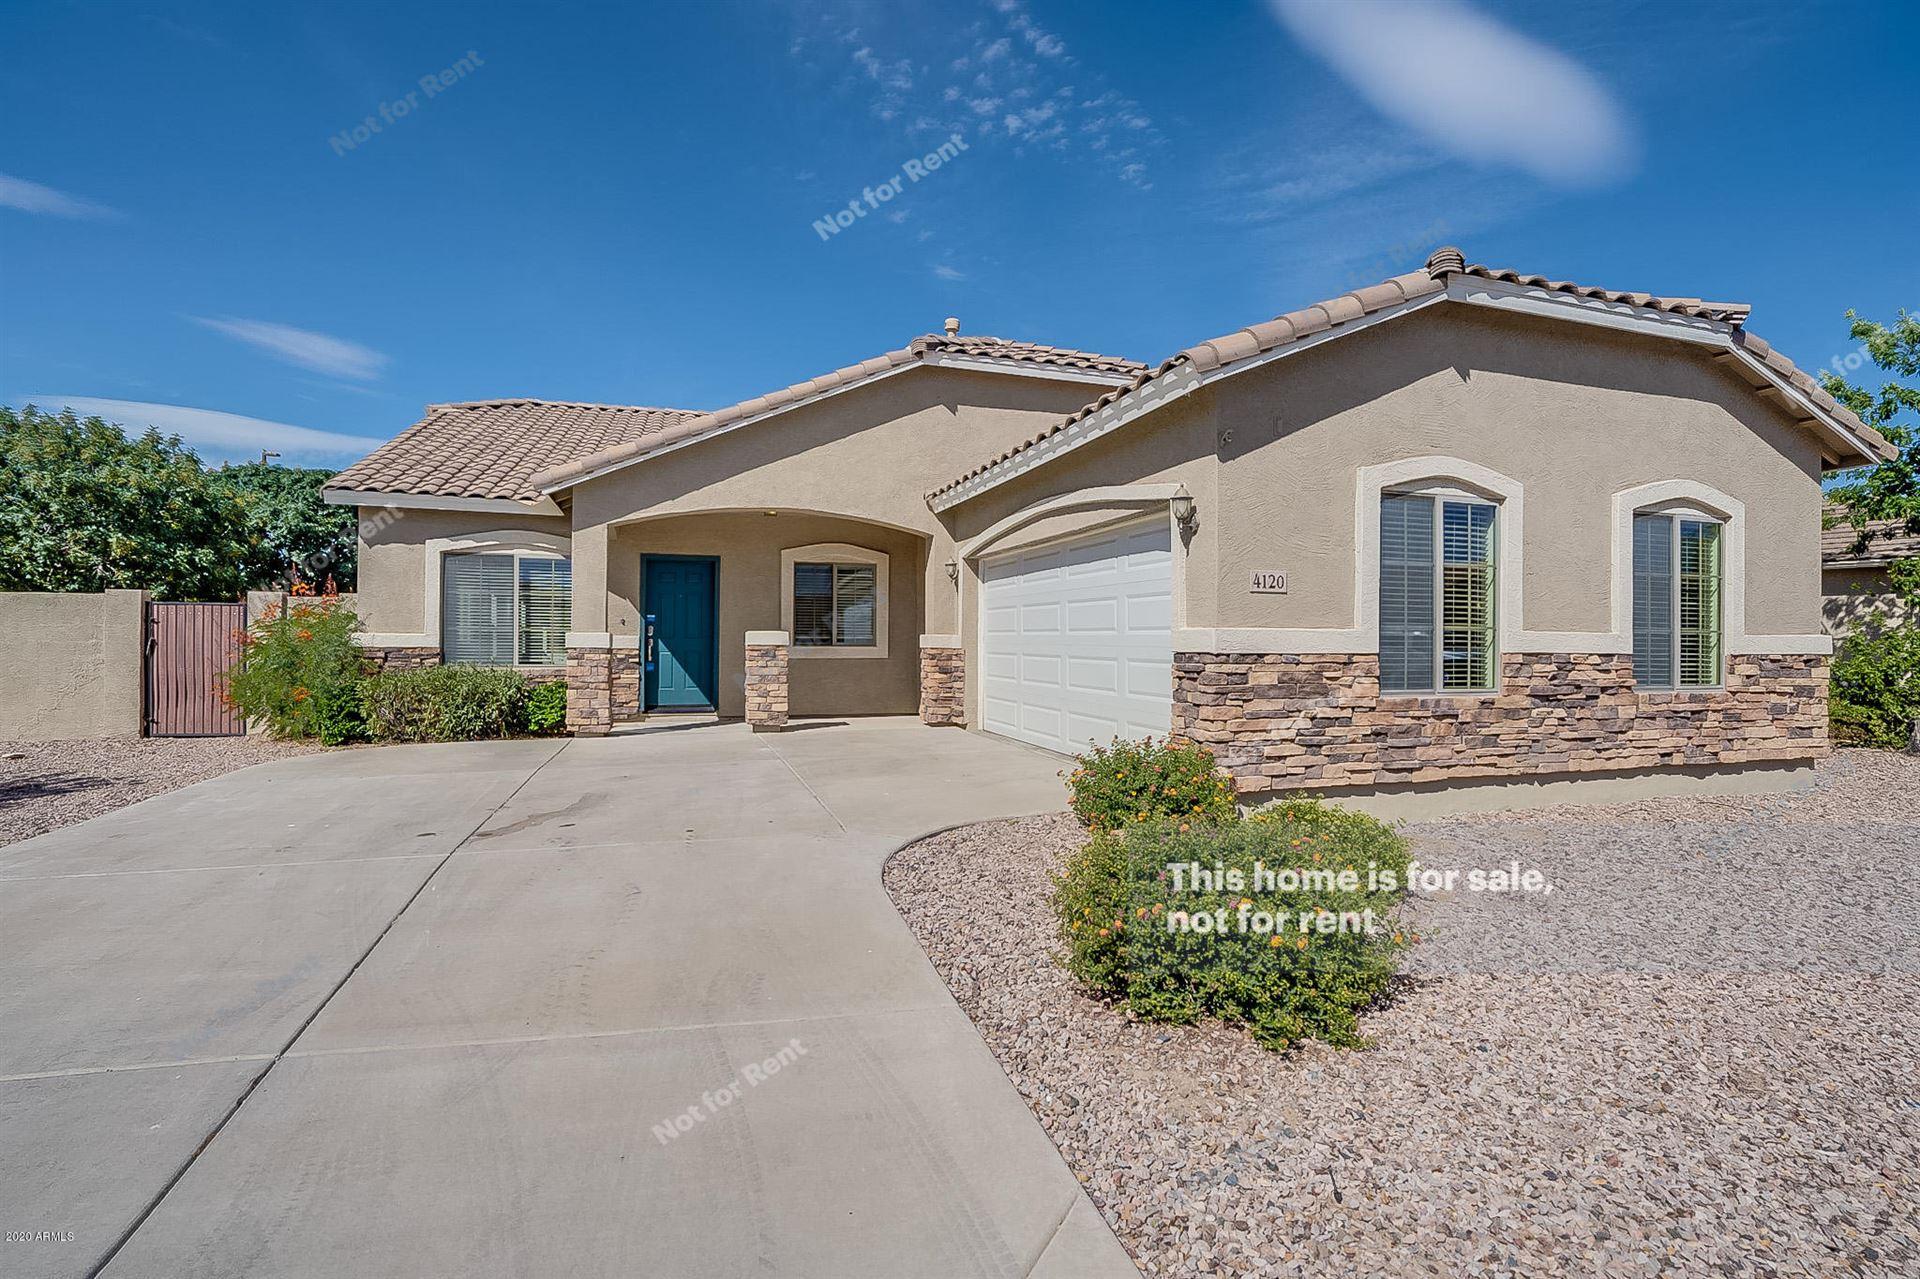 4120 E BLUE SAGE Road, Gilbert, AZ 85297 - #: 6059996